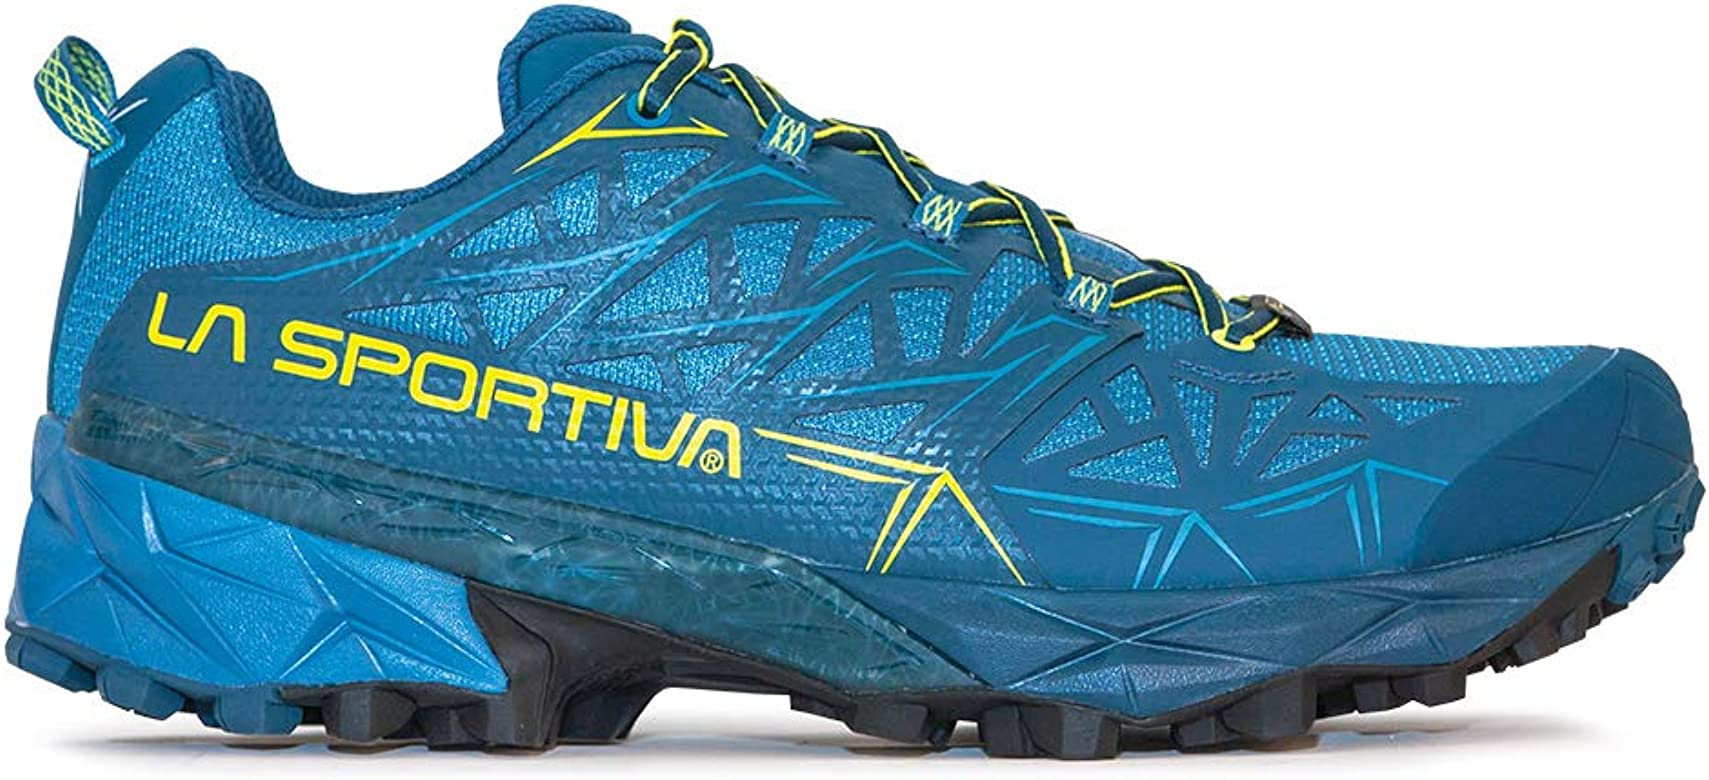 La Sportiva Akyra GTX Running Shoe